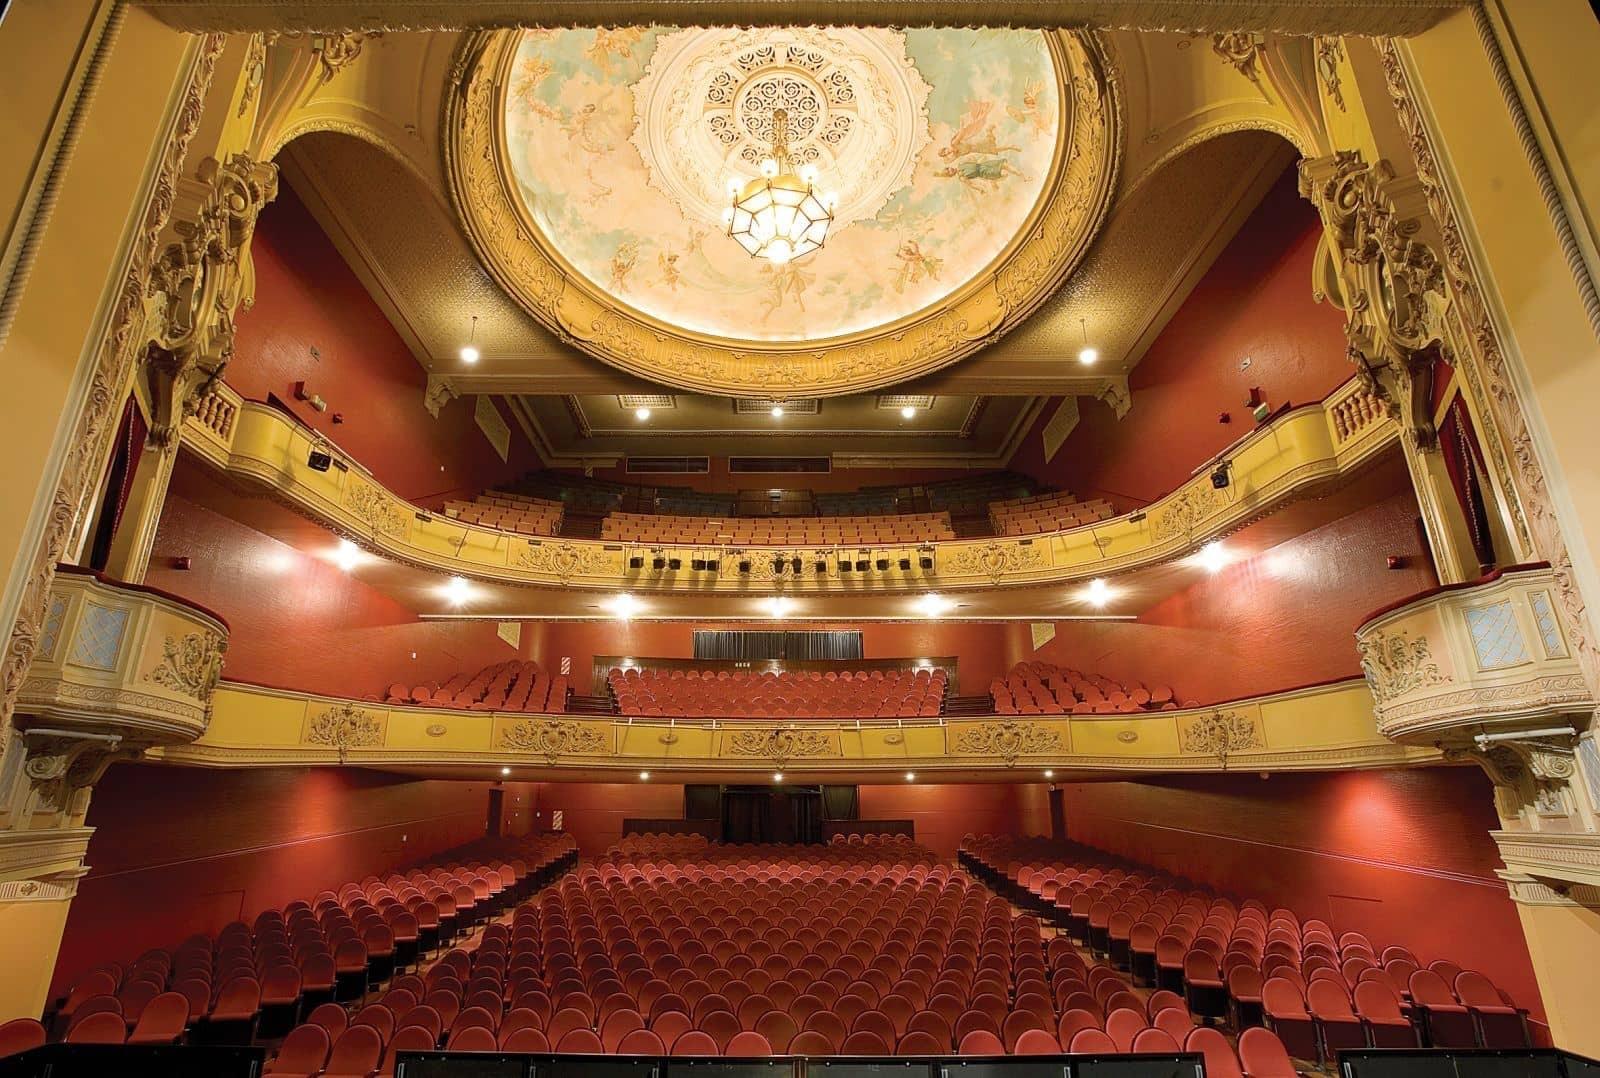 Christchurch Venue - Isaac Theatre Royal